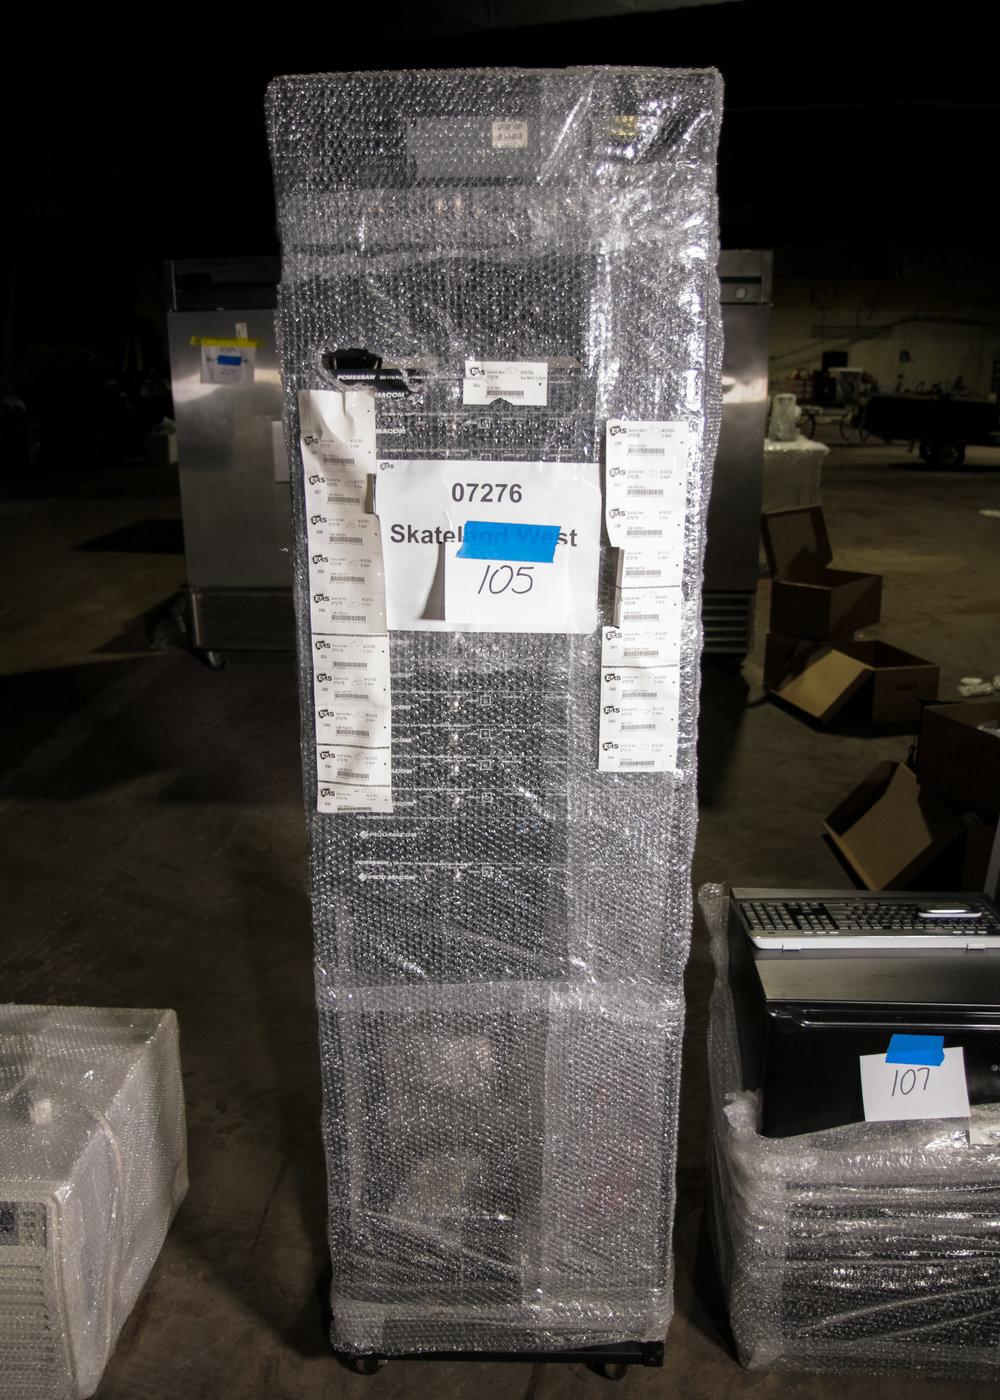 Video Modulator Complete Rack Unit  (6' Tall. 12 Pico Macom Modulators, 2 Headend Amps, 2 Stero Program Limiter, 1 Transformer)